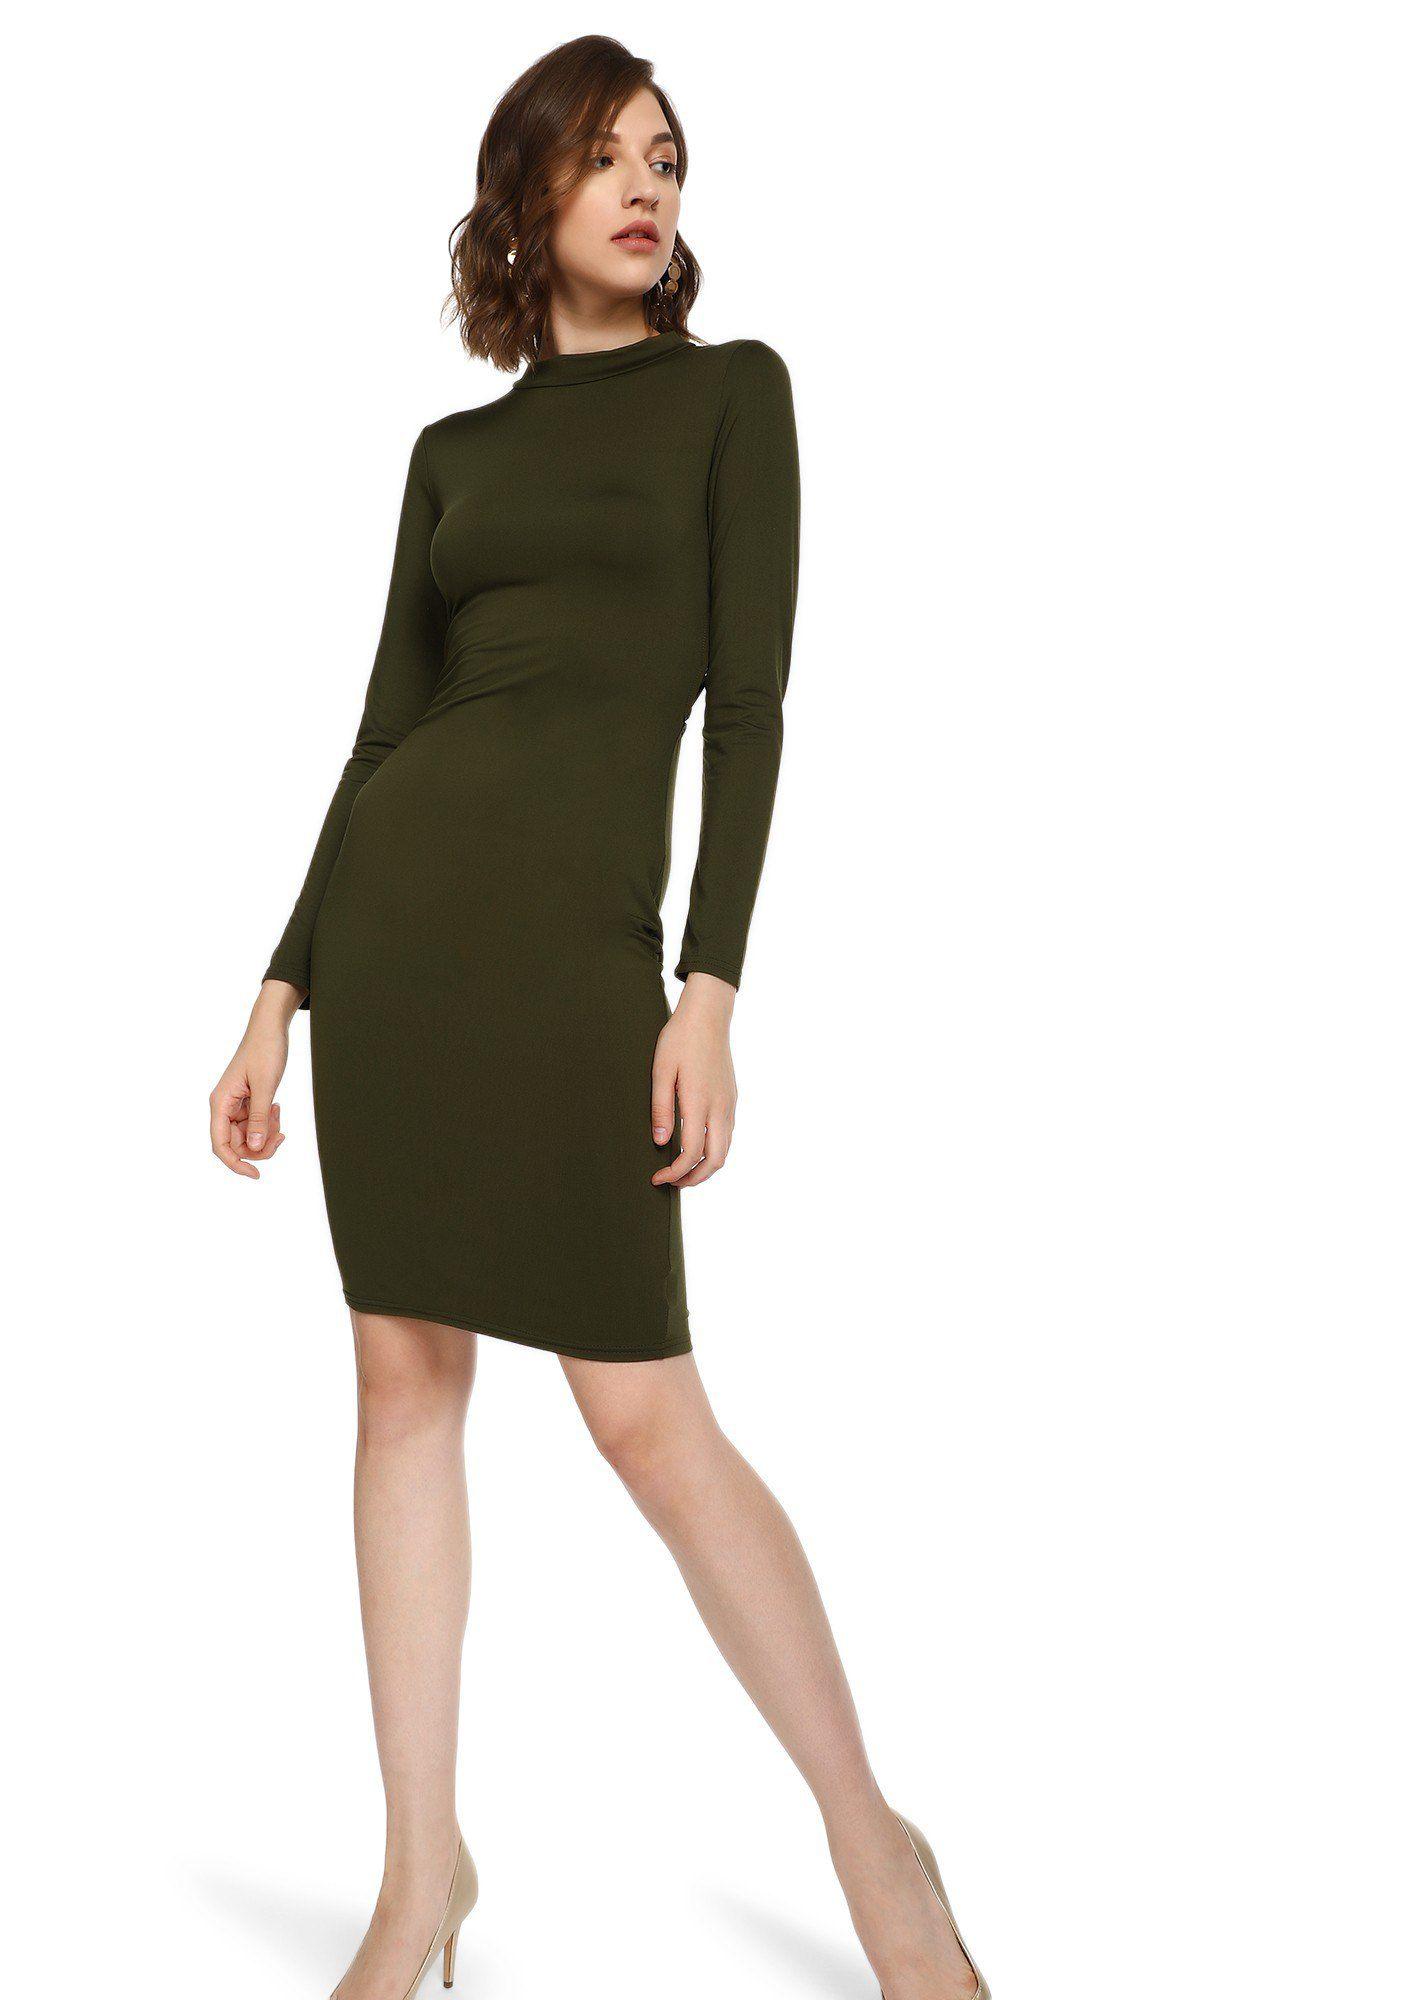 28+ Army green midi dress ideas